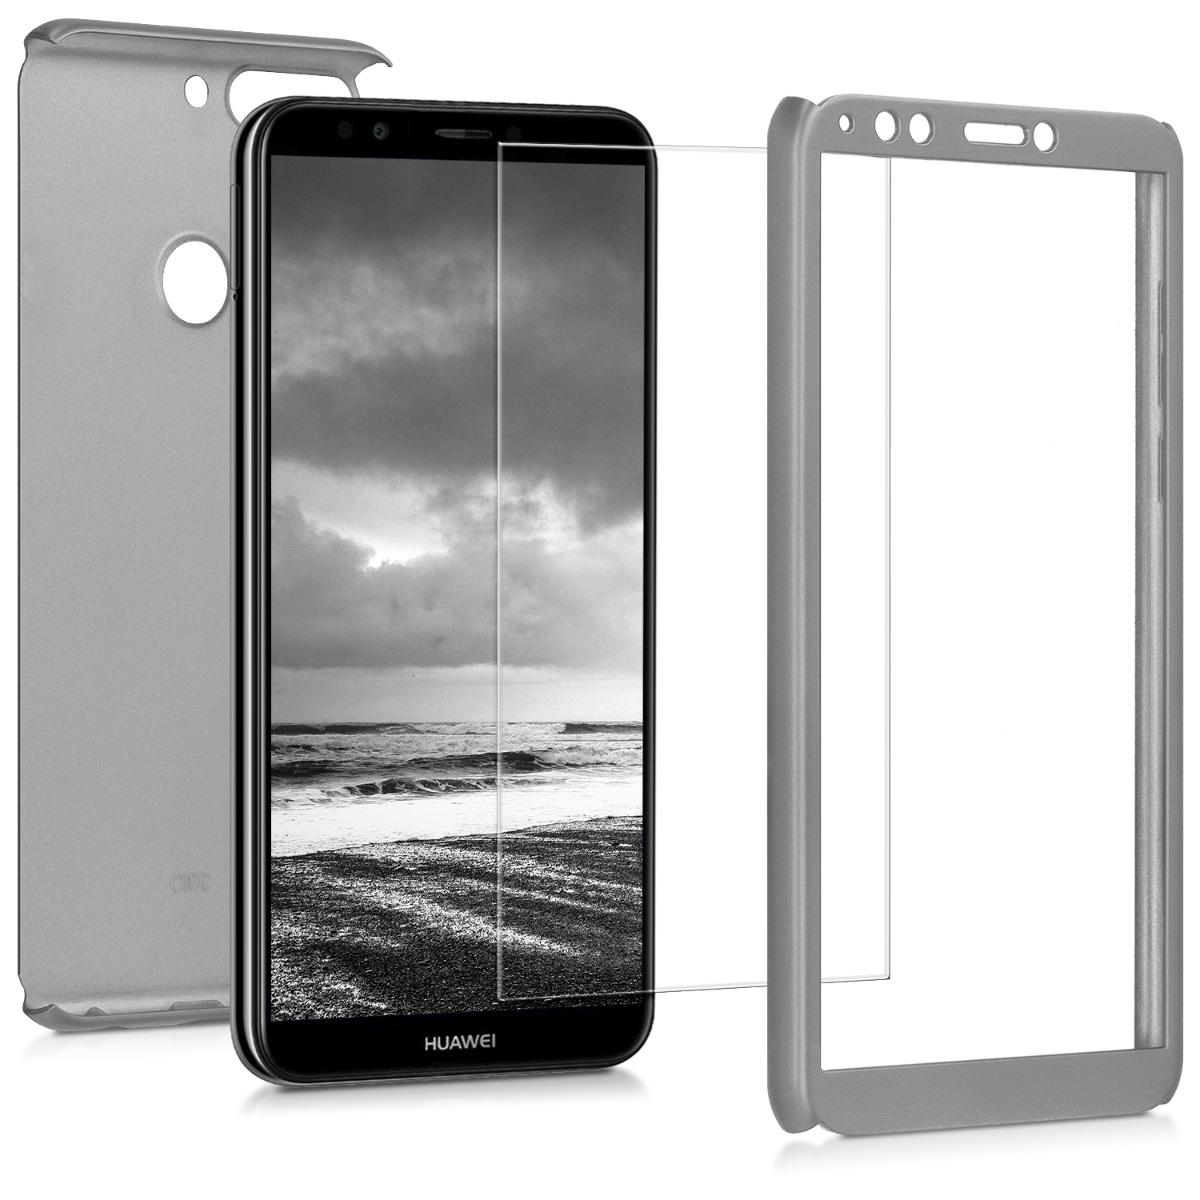 KW Θήκη Full Body Huawei Y7 (2018) /Y7 Prime (2018) & Screen Protector - Metallic Silver (45640.67)